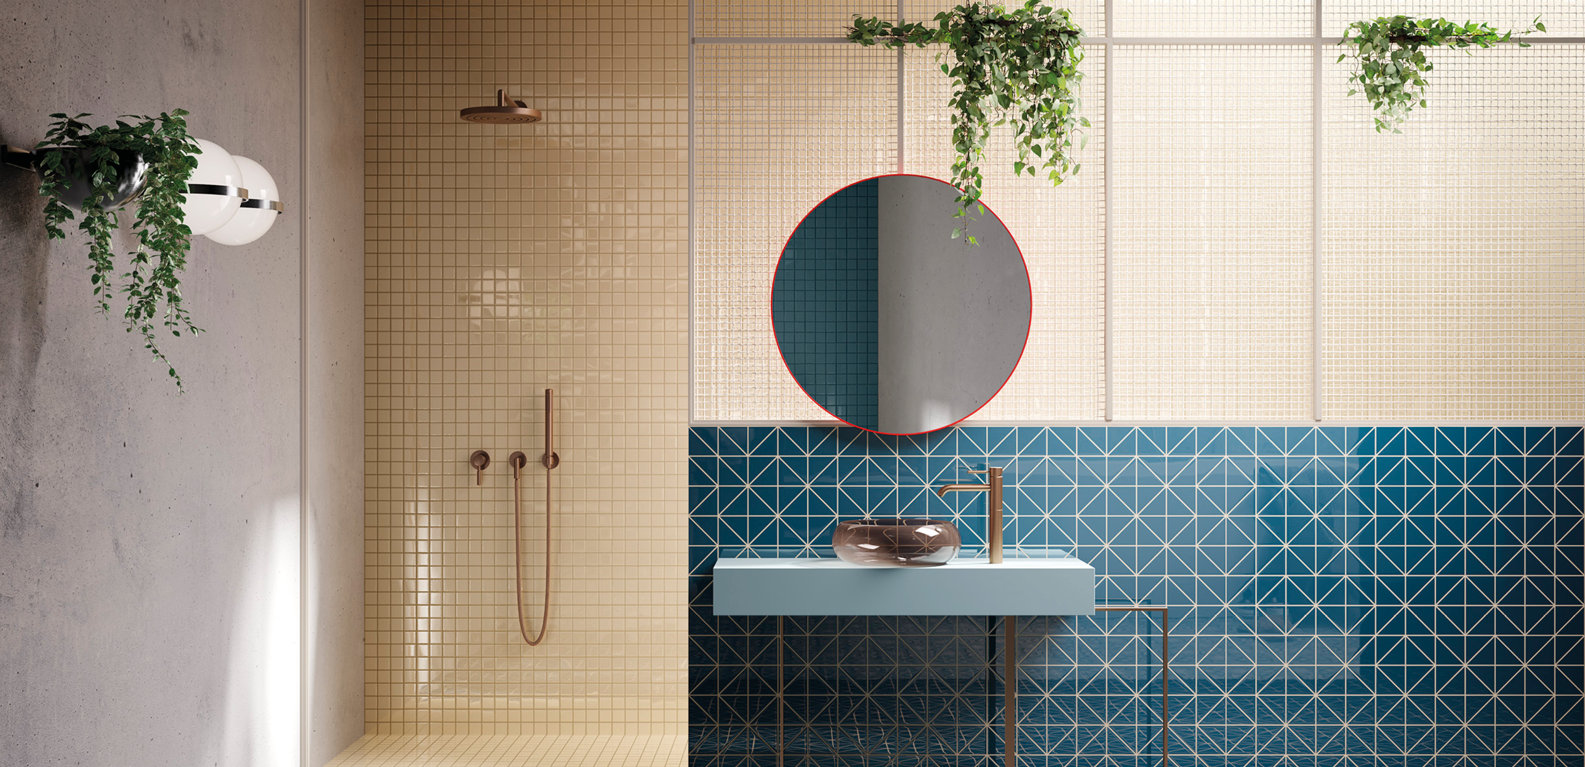 Gres Porcellanato Piastrelle Cucina made in italy tiles, glazed porcelain stoneware ceramic vogue.